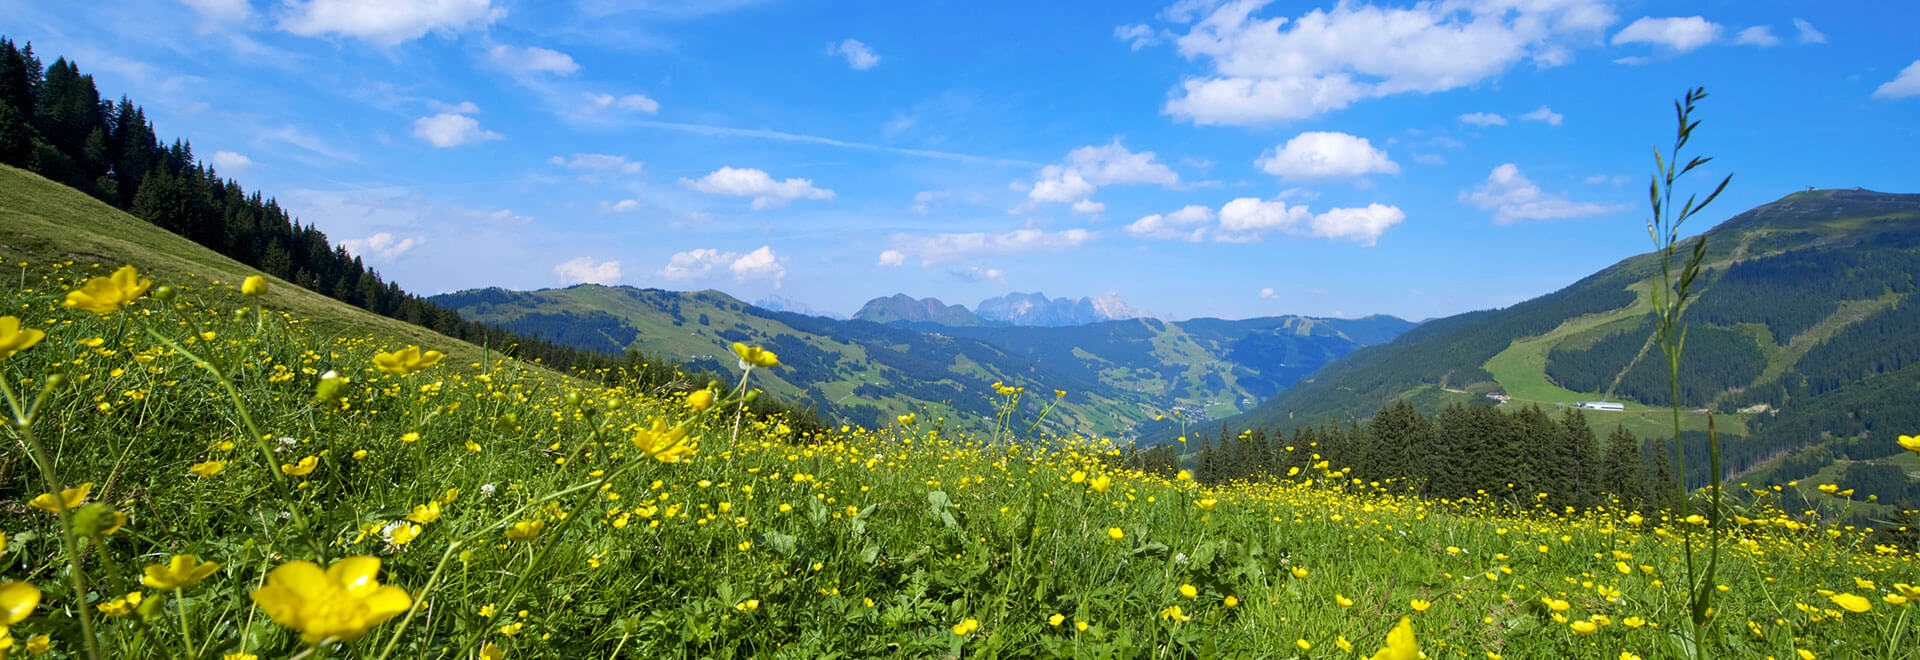 Summer Saalbach Hinterglemm